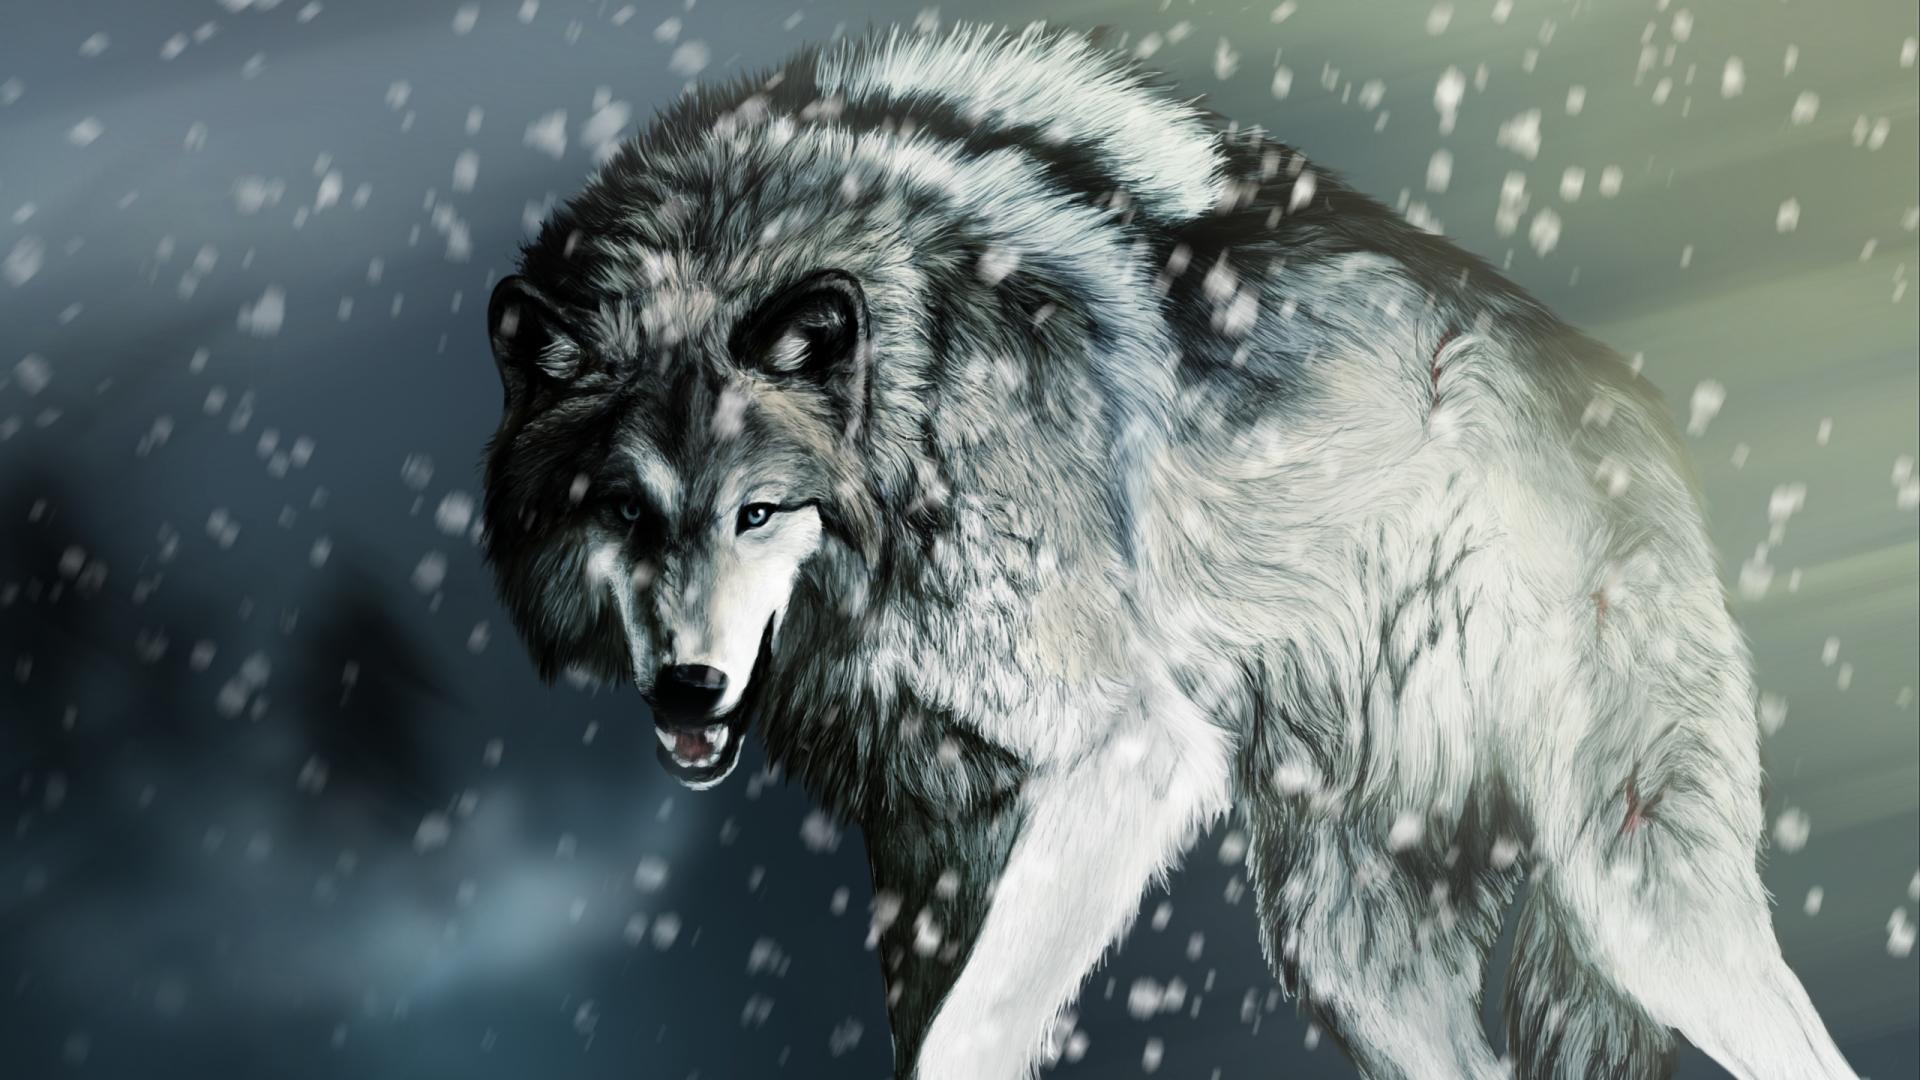 HD Wolf Wallpapers - WallpaperSafari